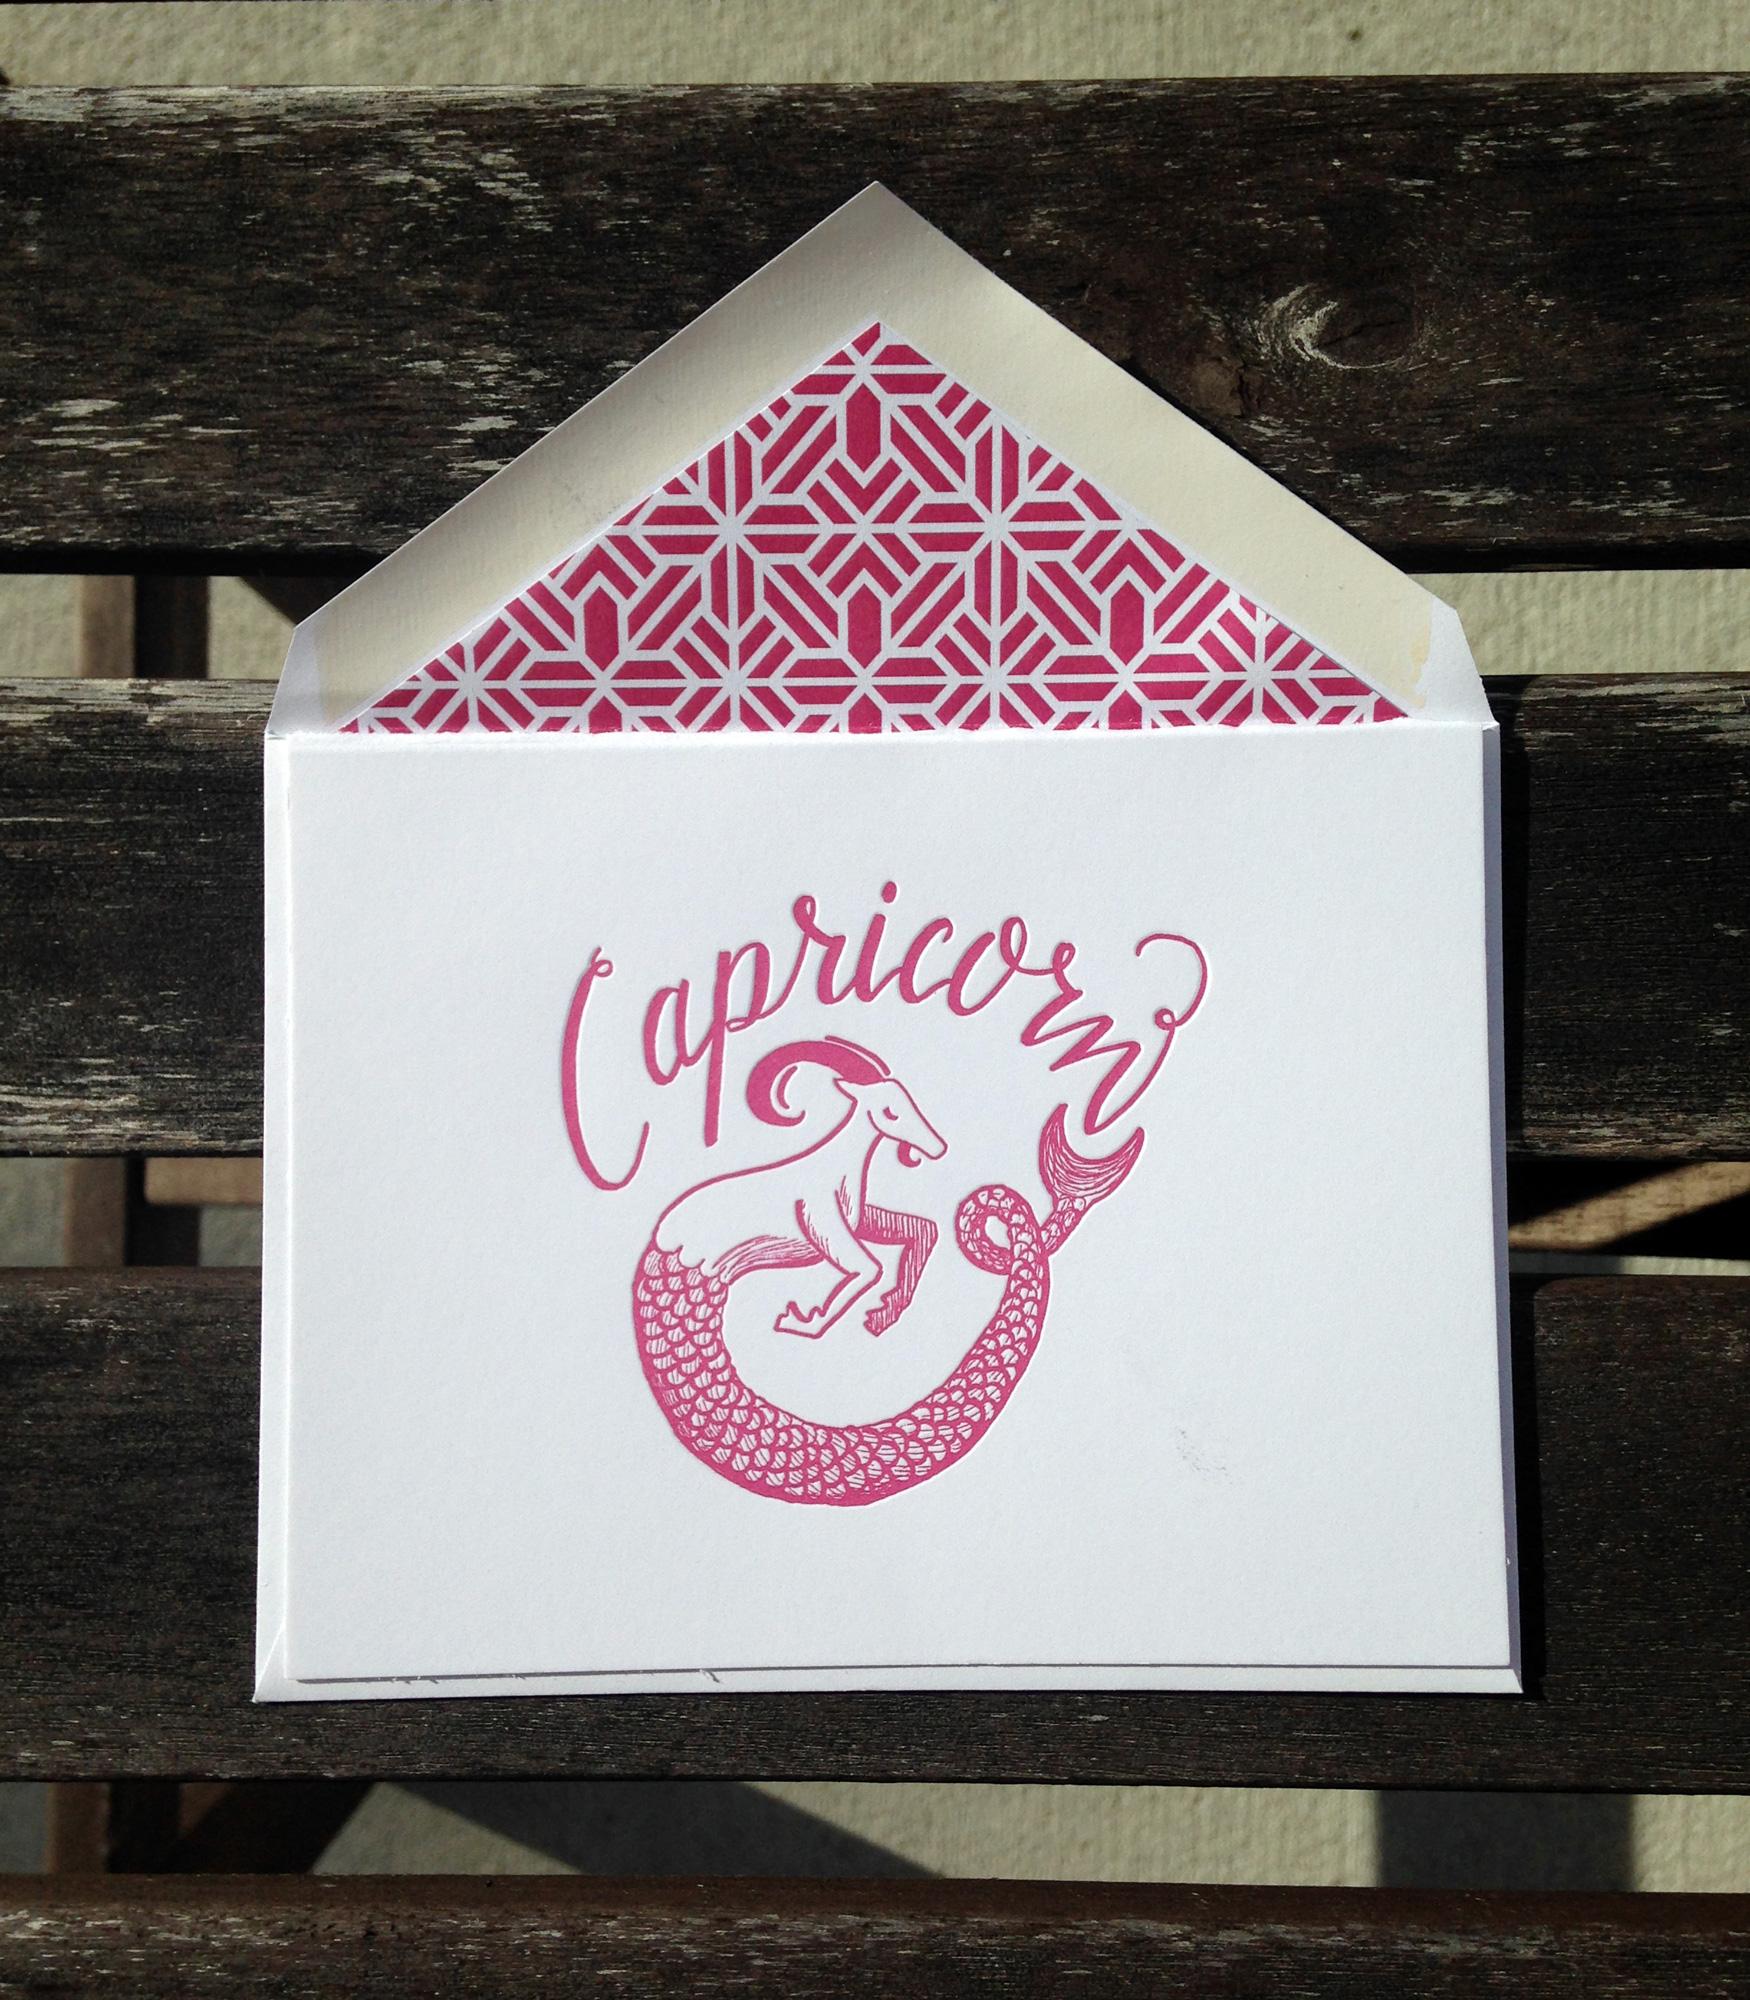 Capricorn Astrology Letterpress Greeting Card